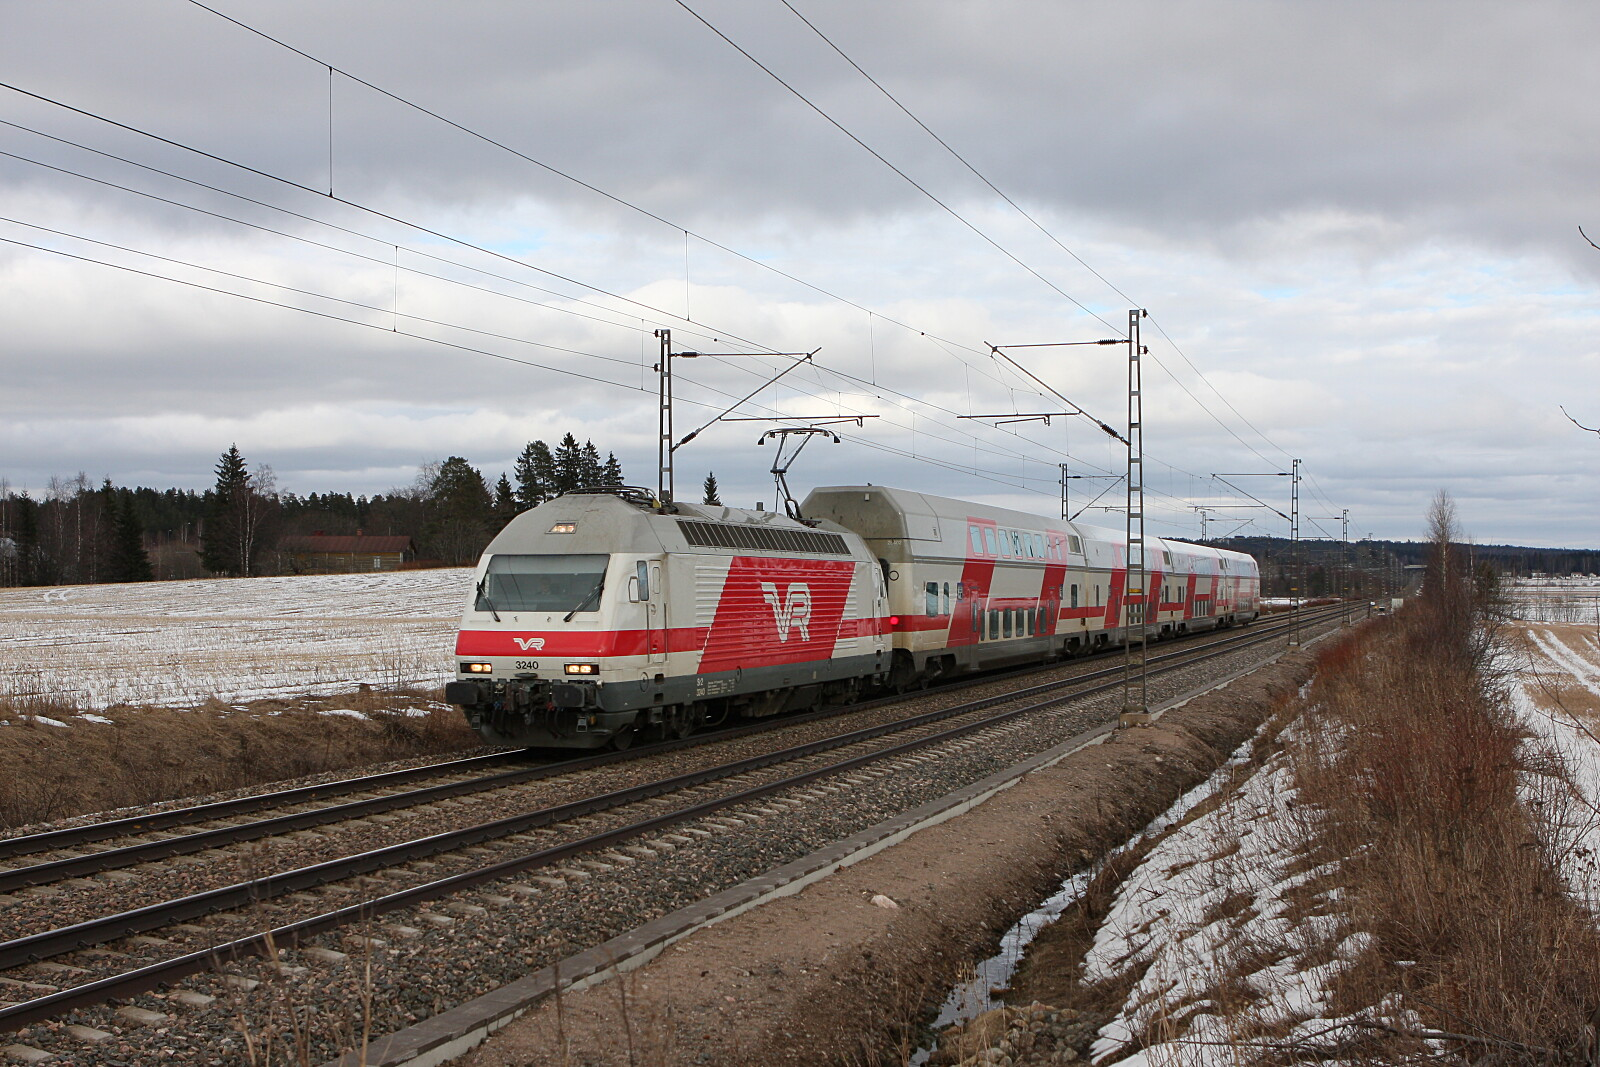 Vr Lahti